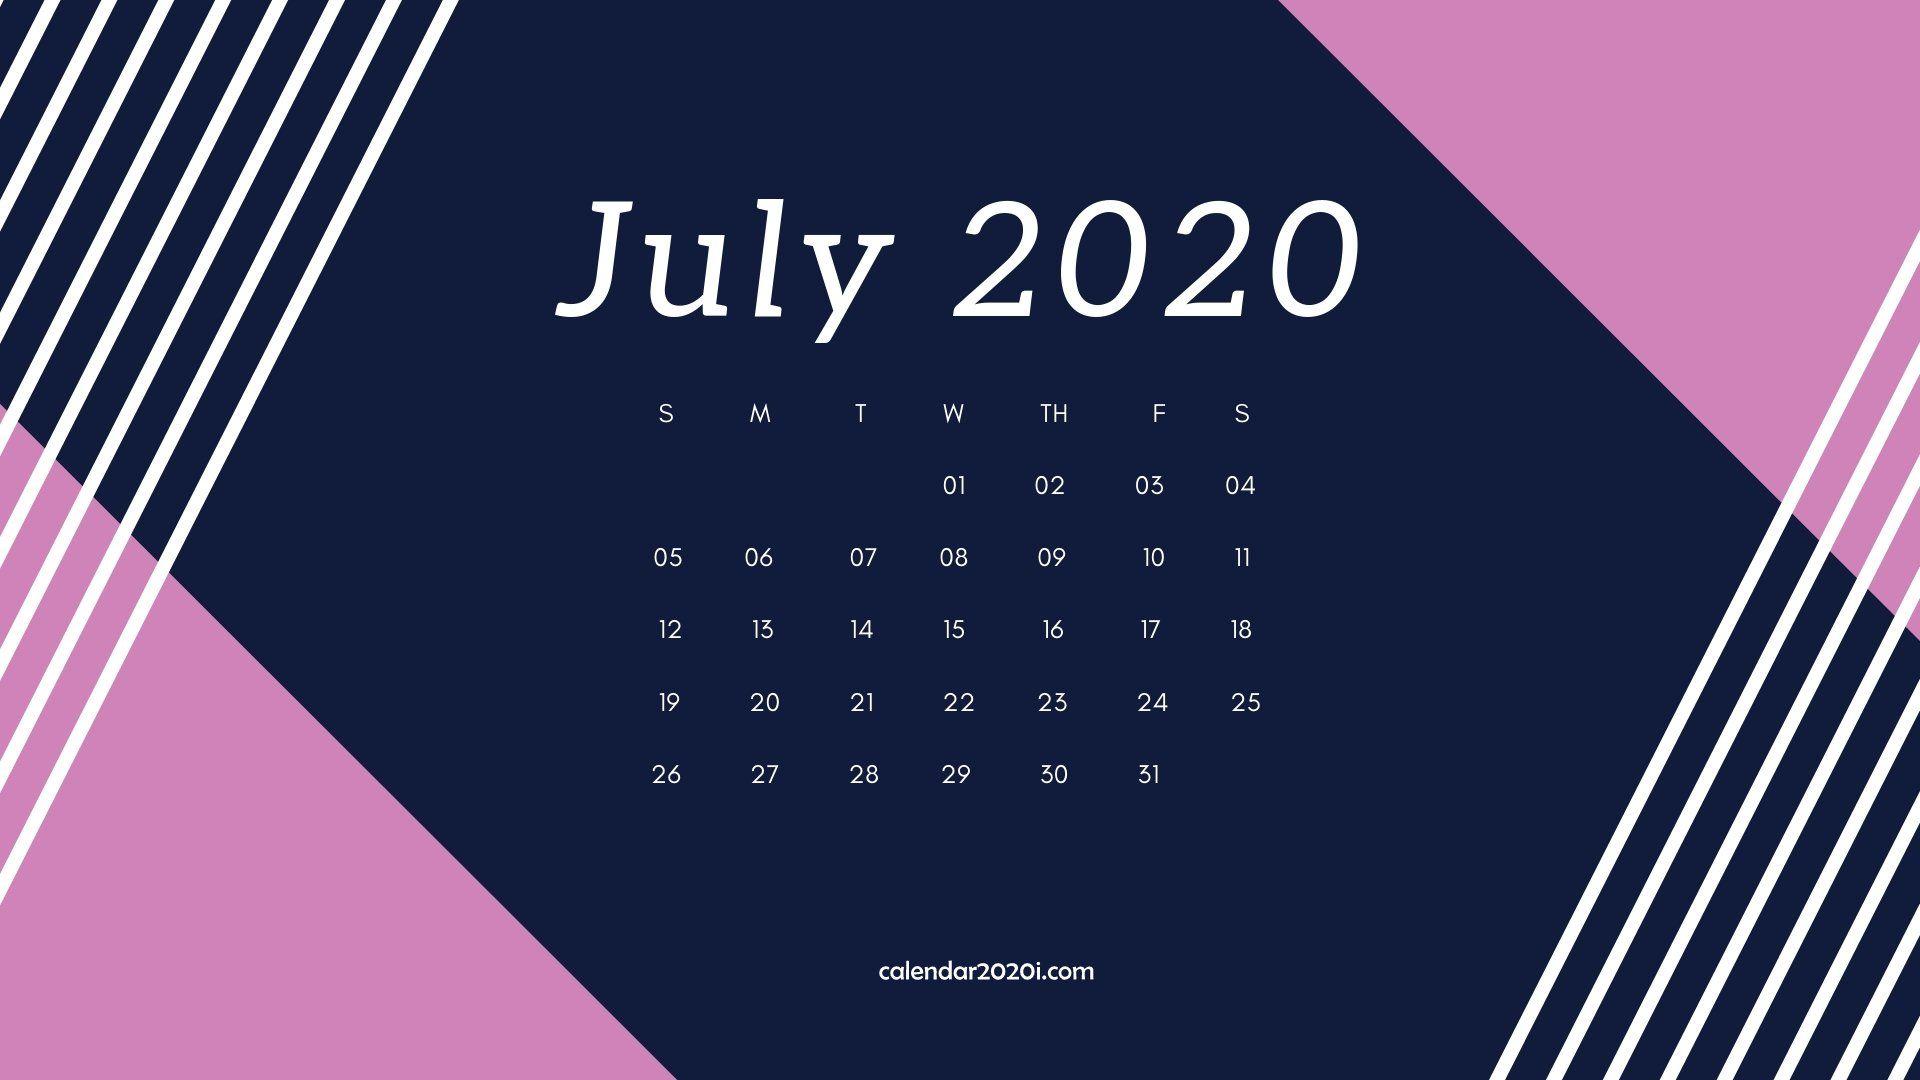 Wallpaper January 2020 Desktop Calendar